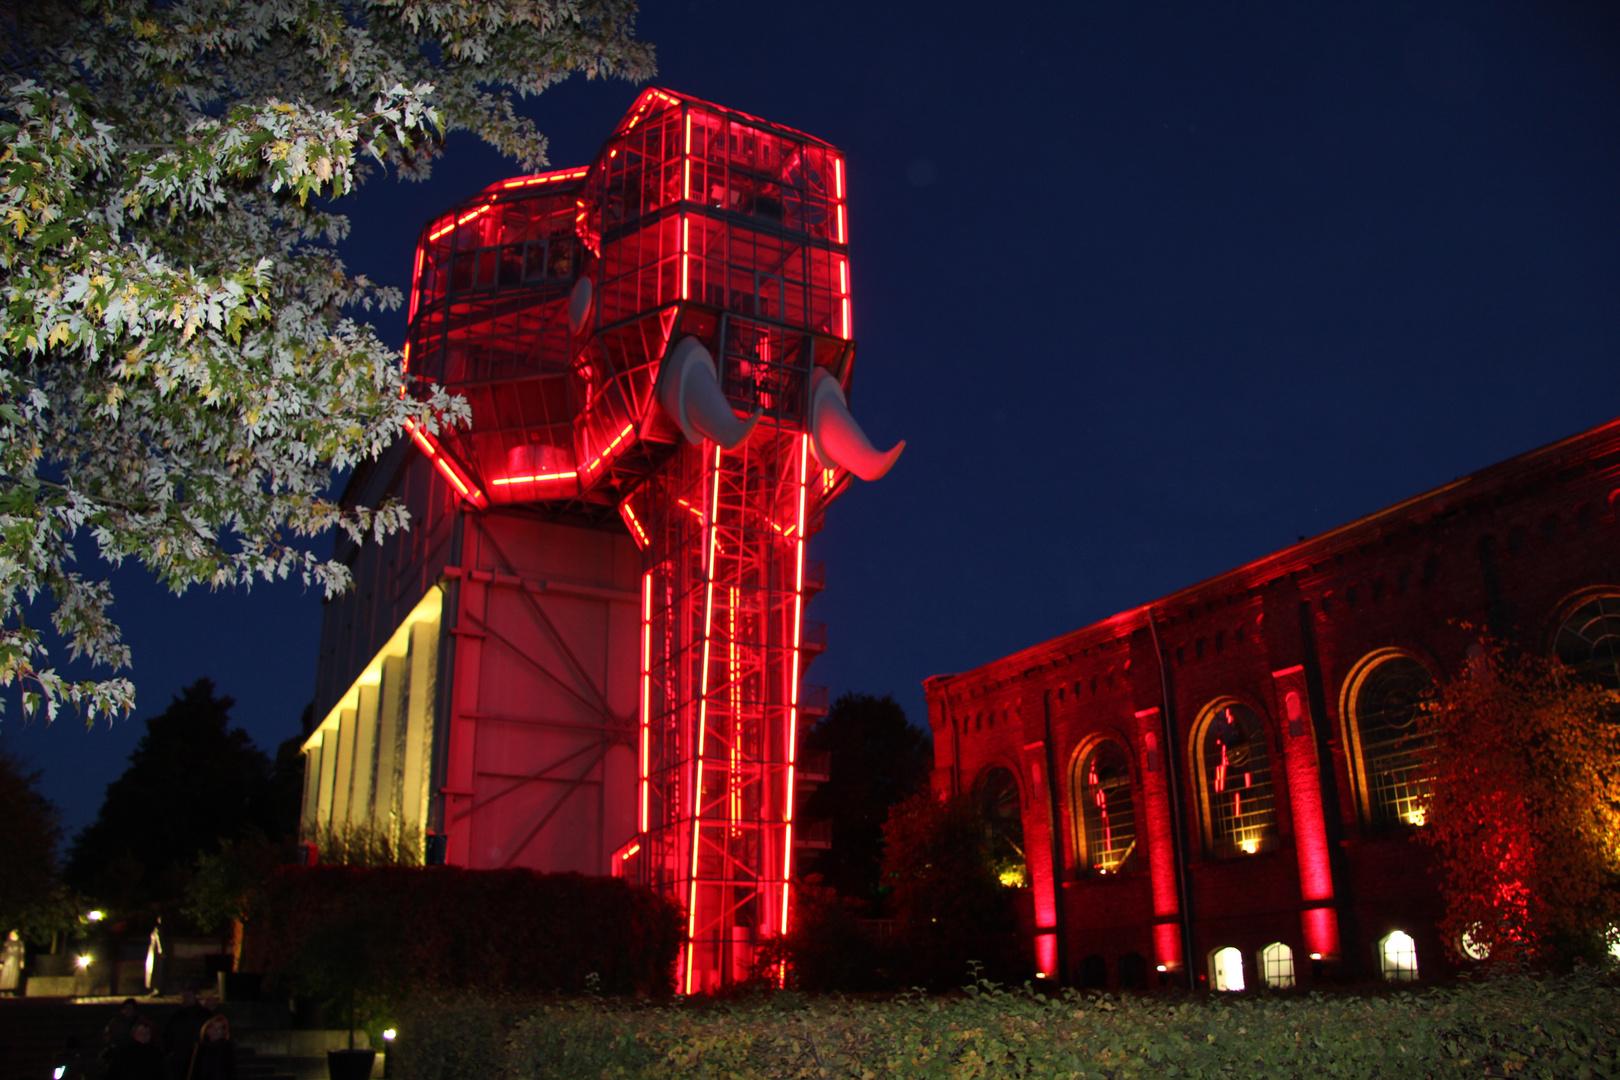 Elefant in Rot